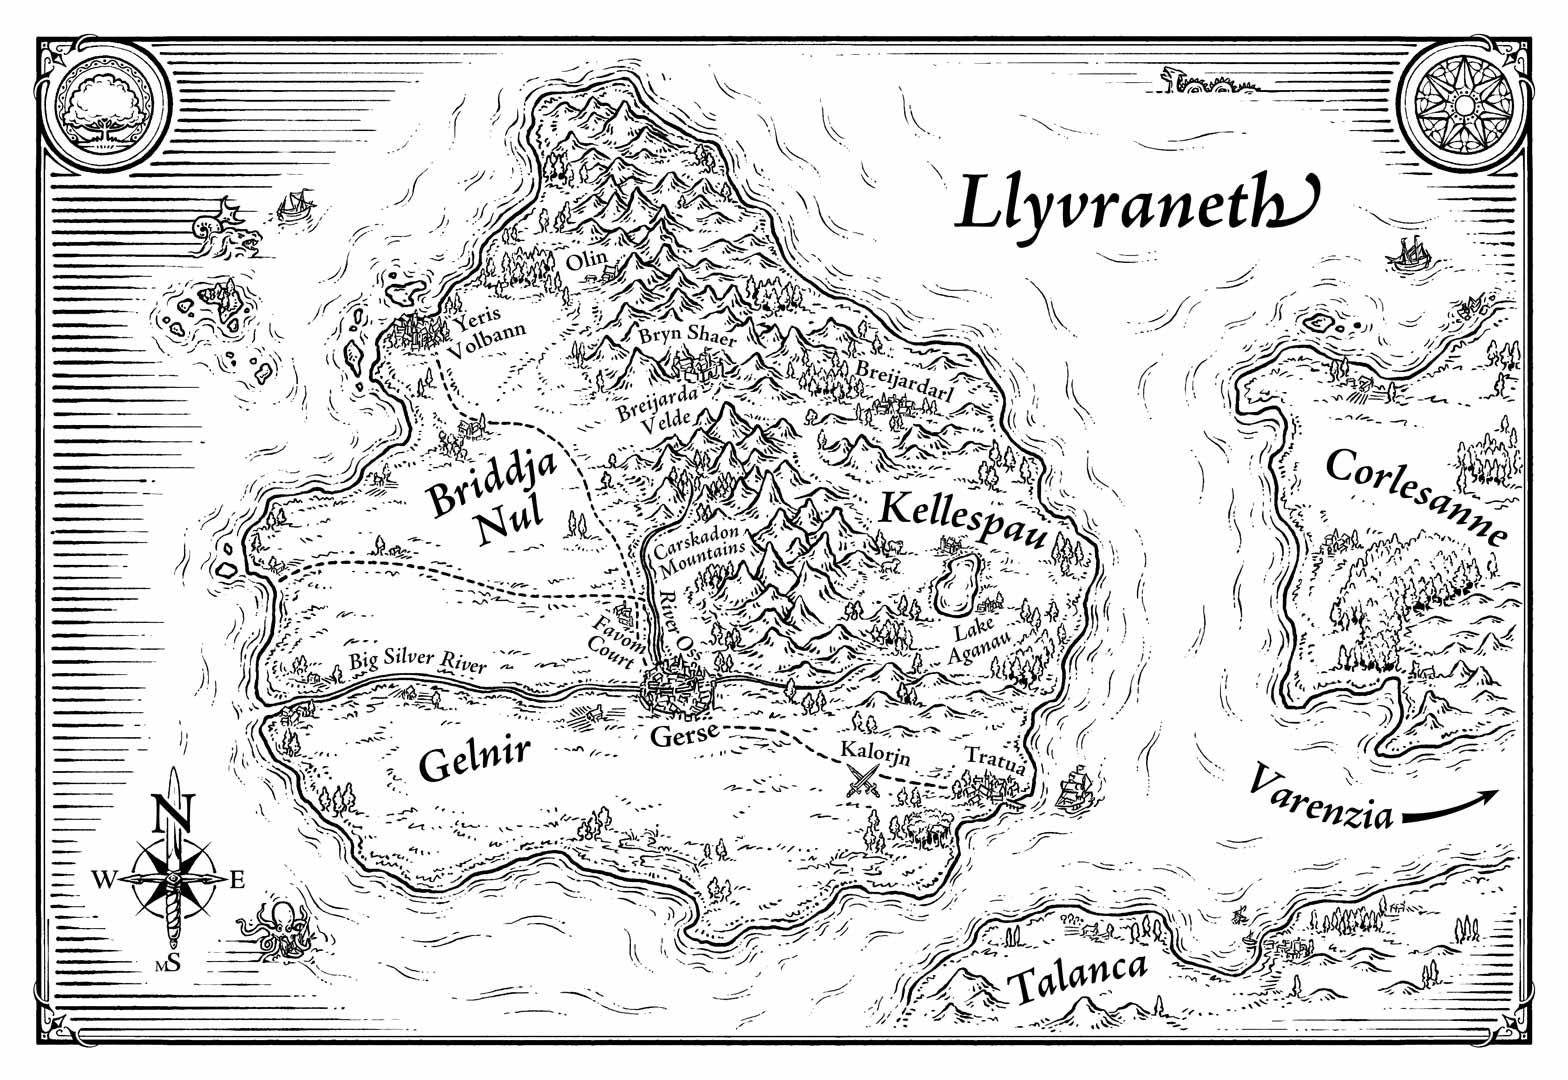 Map of Llyvraneth